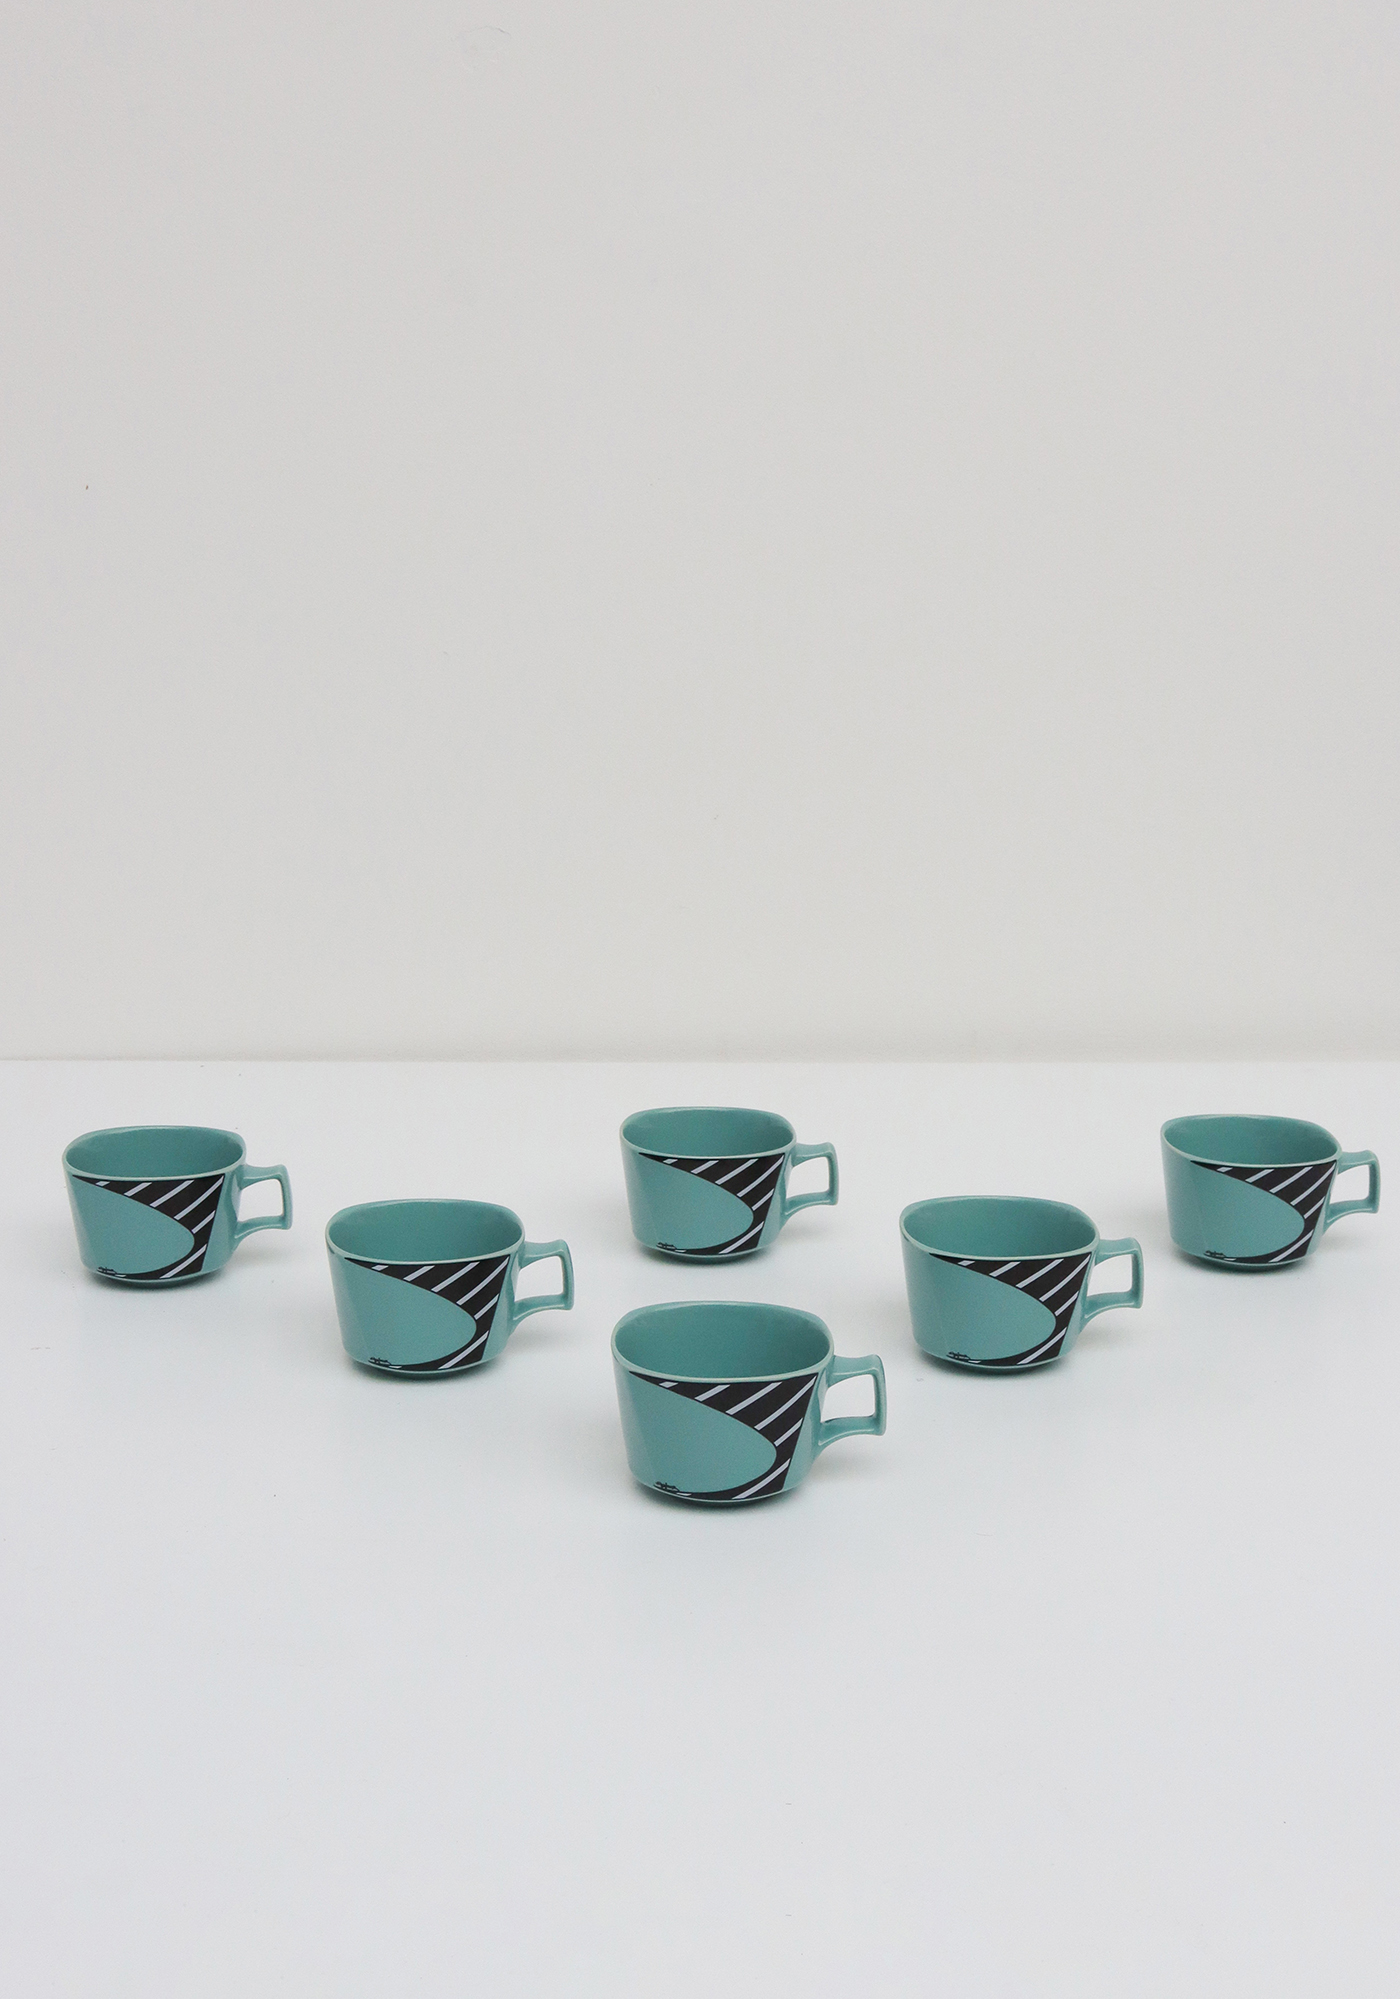 Flash Coffee and tea set by Dorothy Hafner for Rosenthalimage 6